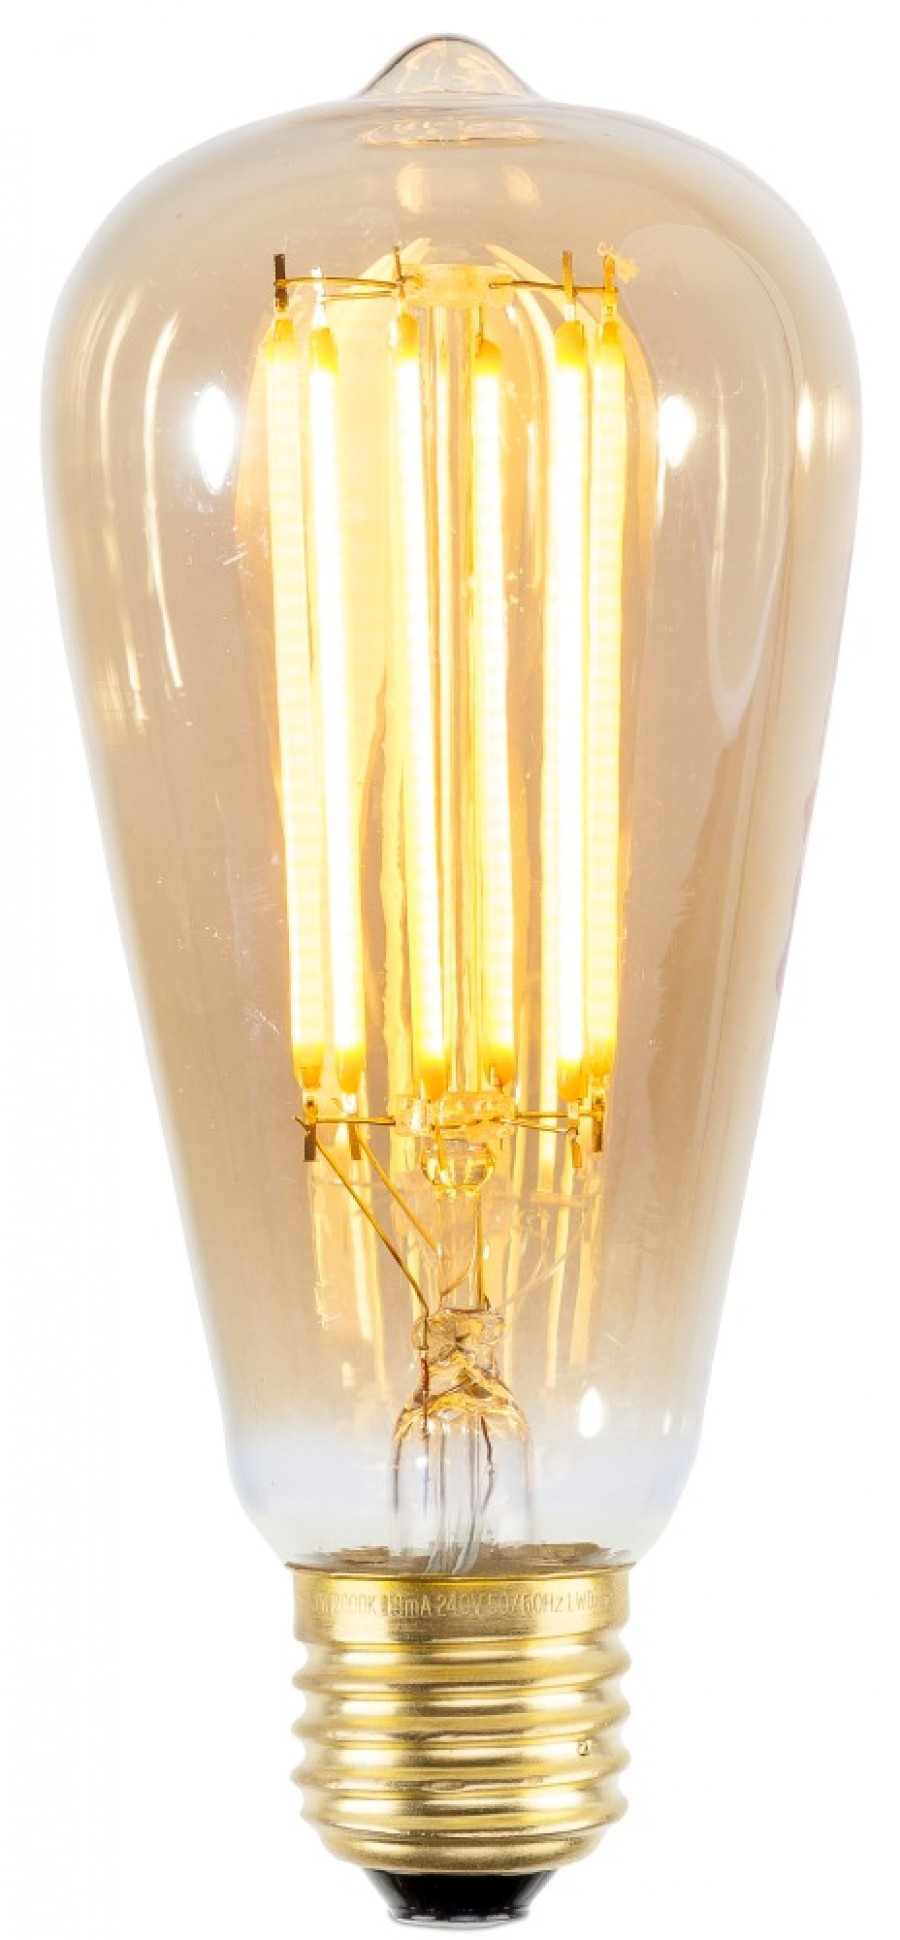 LED lamp langwerpig